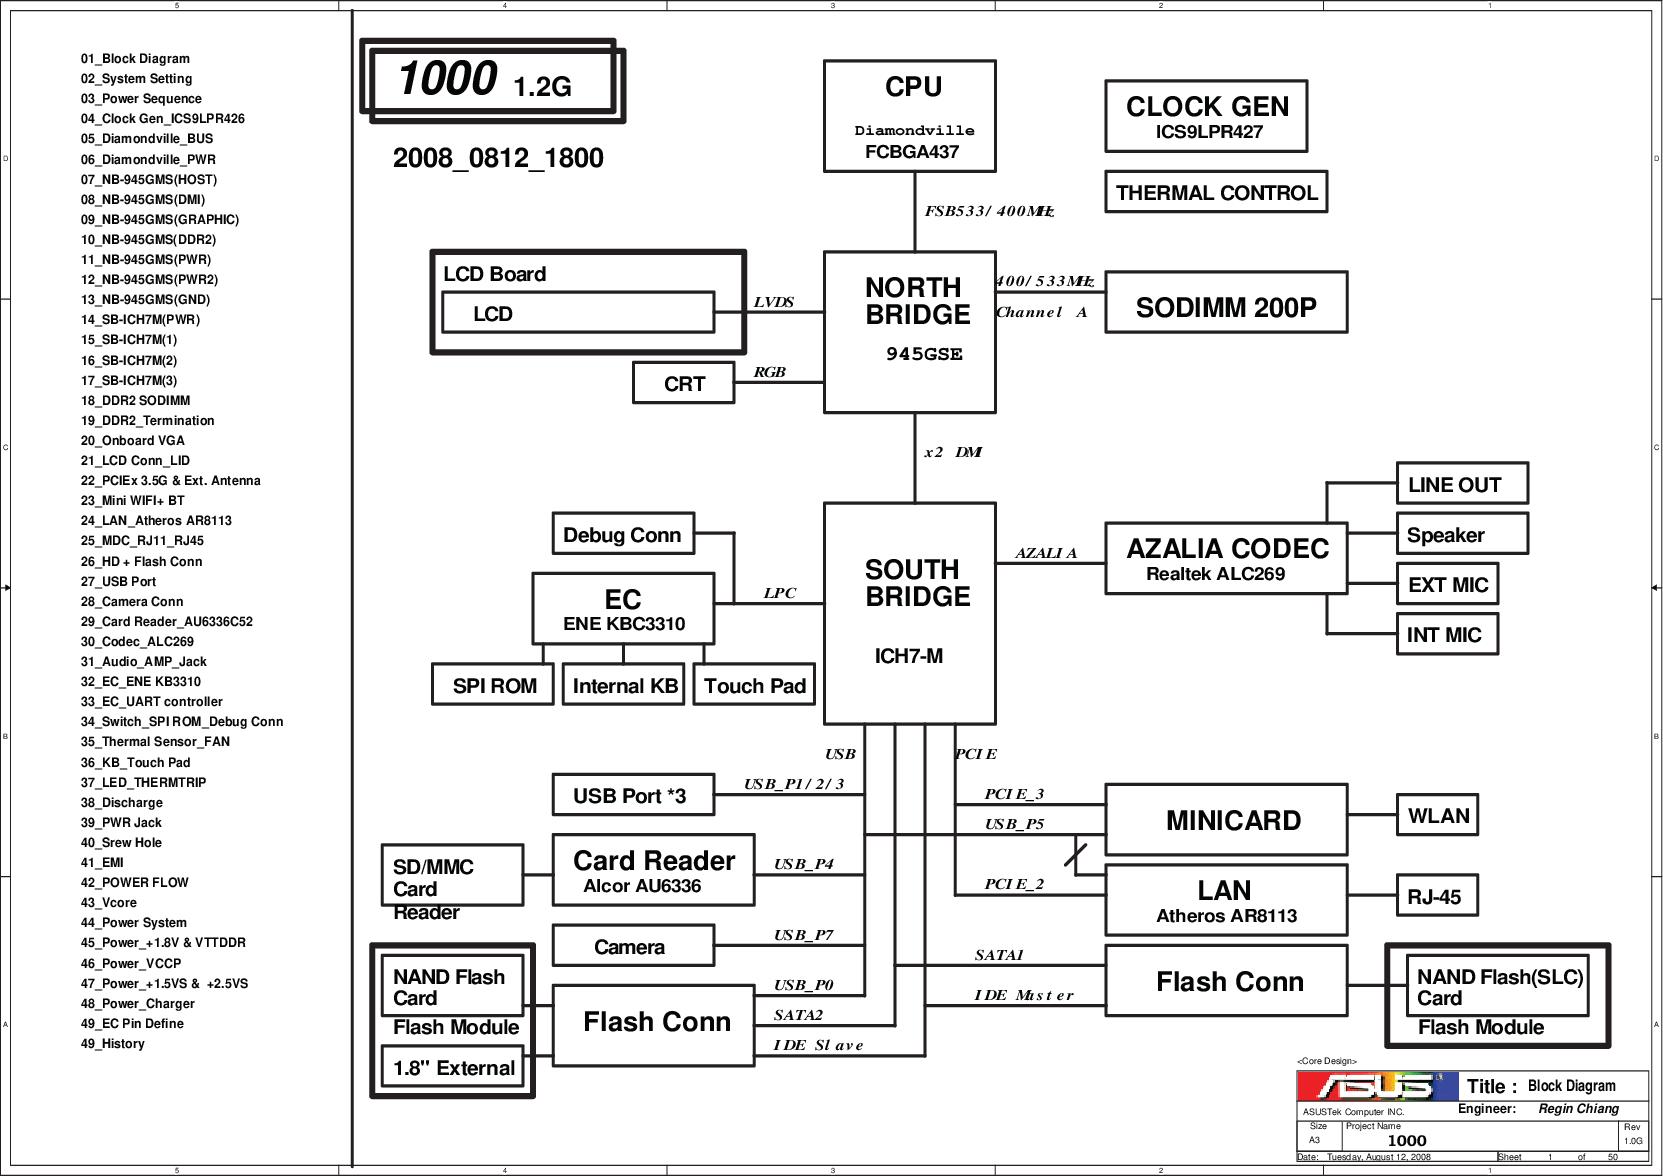 ASUS P30A REALTEK ALC269 AUDIO DRIVERS WINDOWS XP